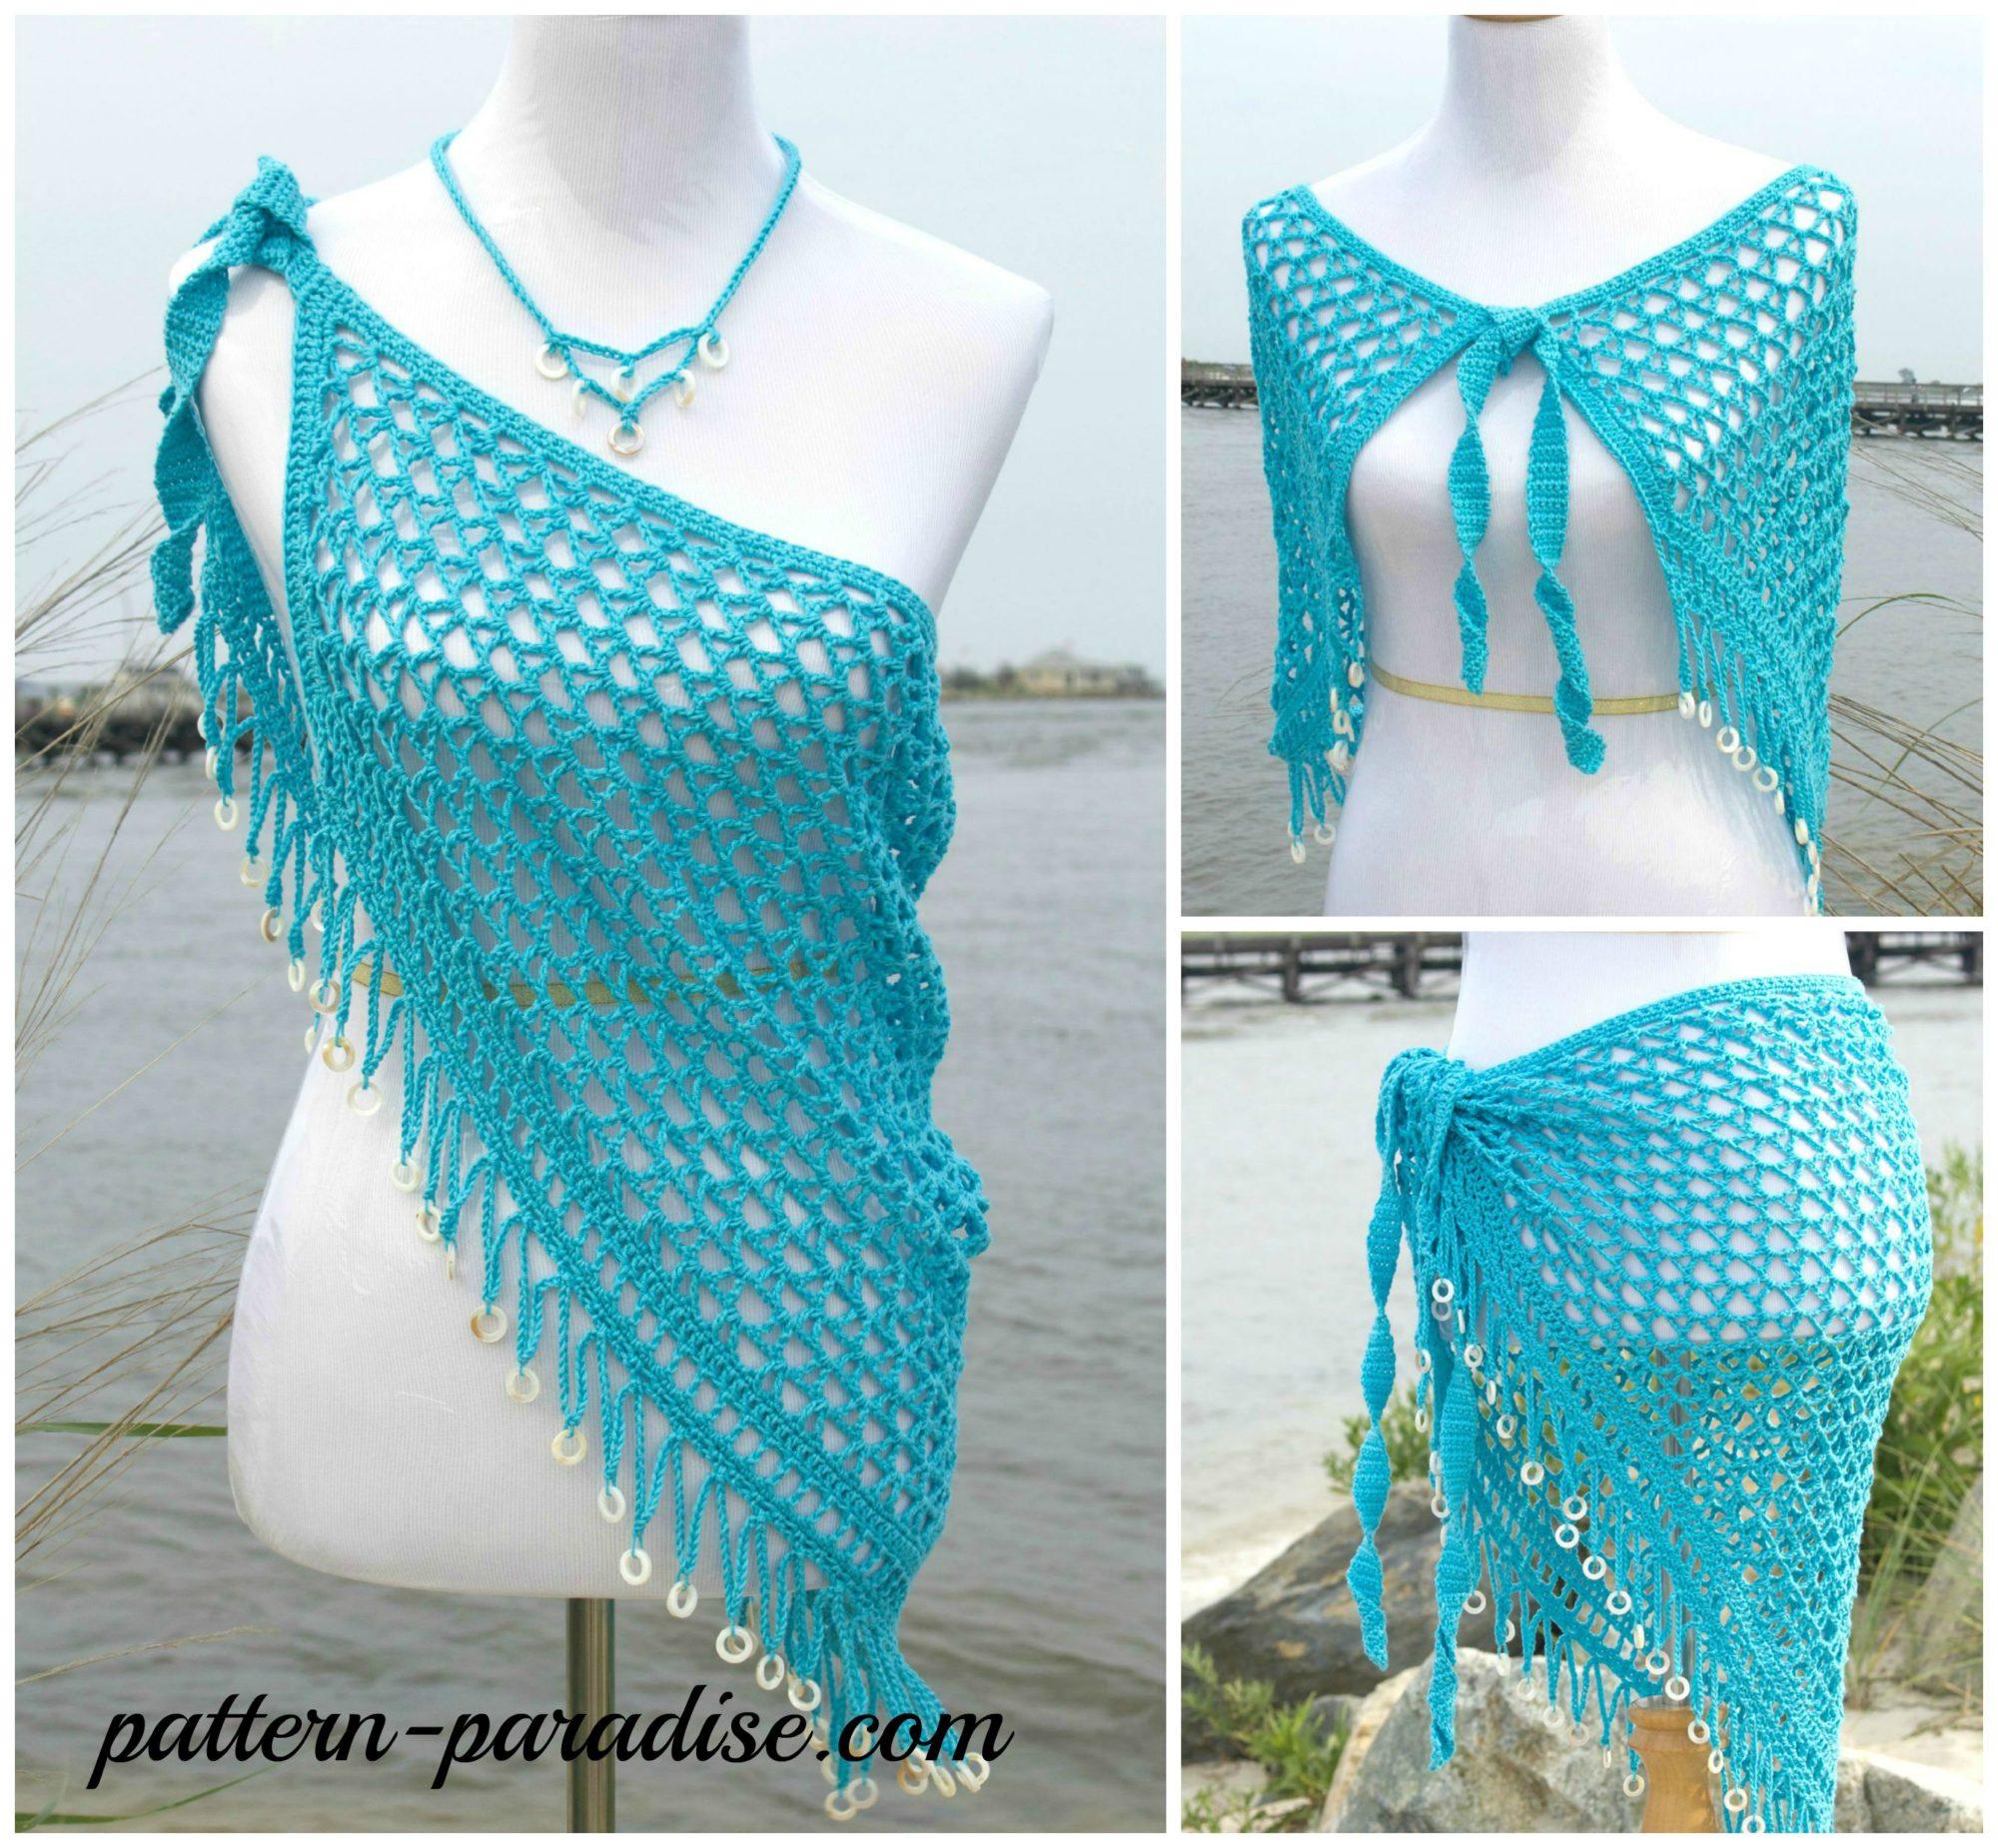 Crochet Pattern Reggae Dreams Wrap Amp Shawl Pattern Paradise